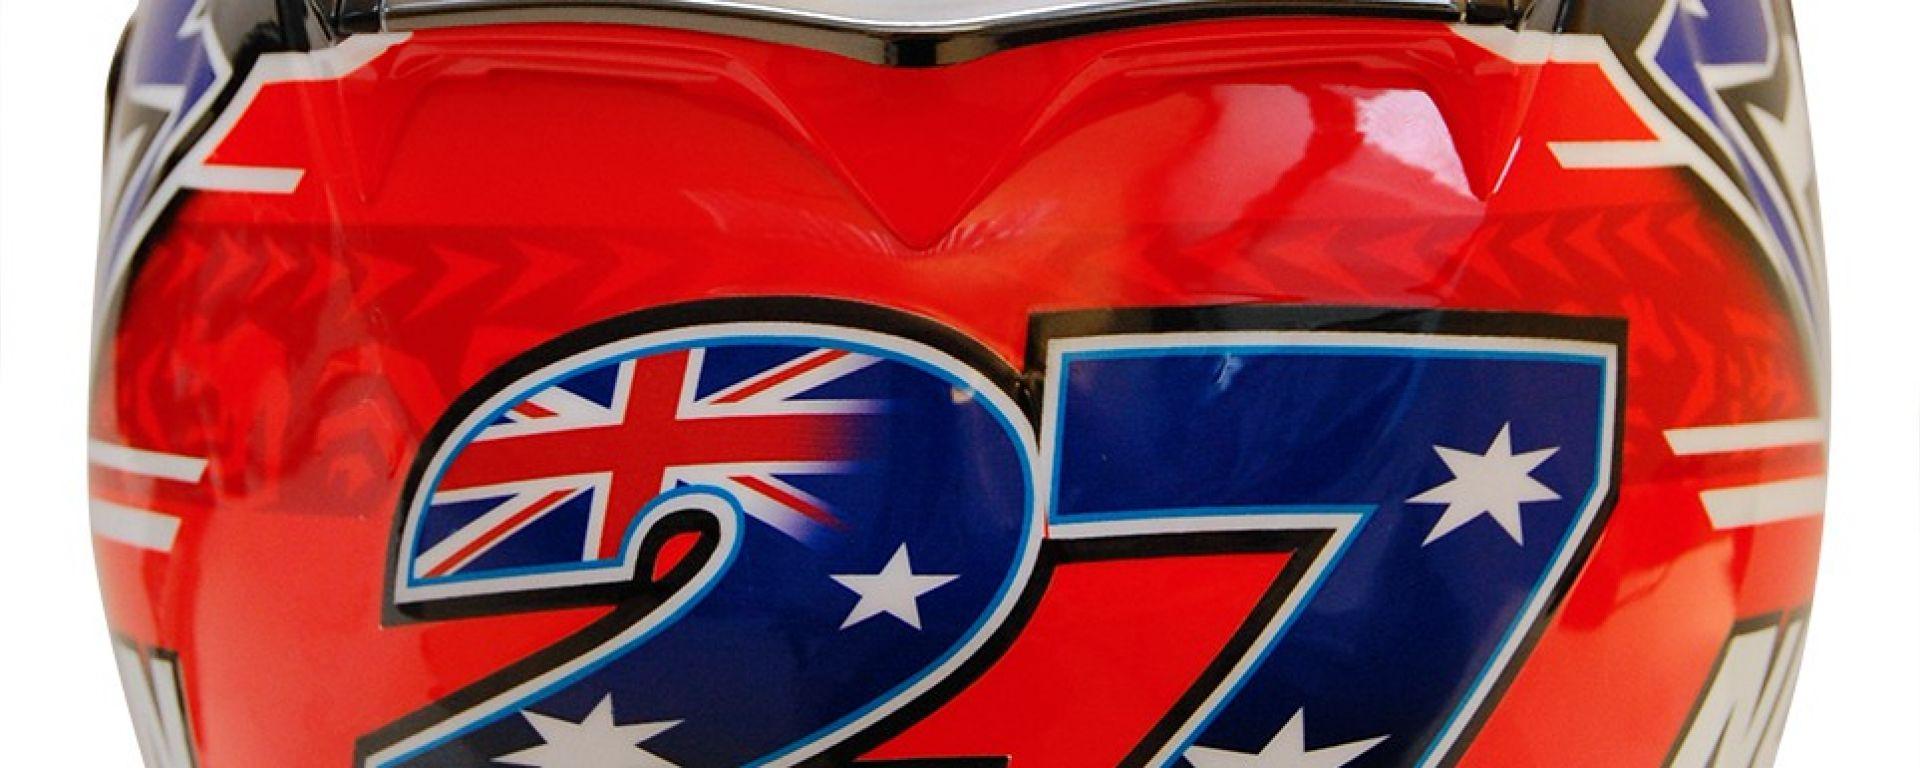 Nolan: casco X-802RRUltra Carbon Carbon Fitting per Casey Stoner